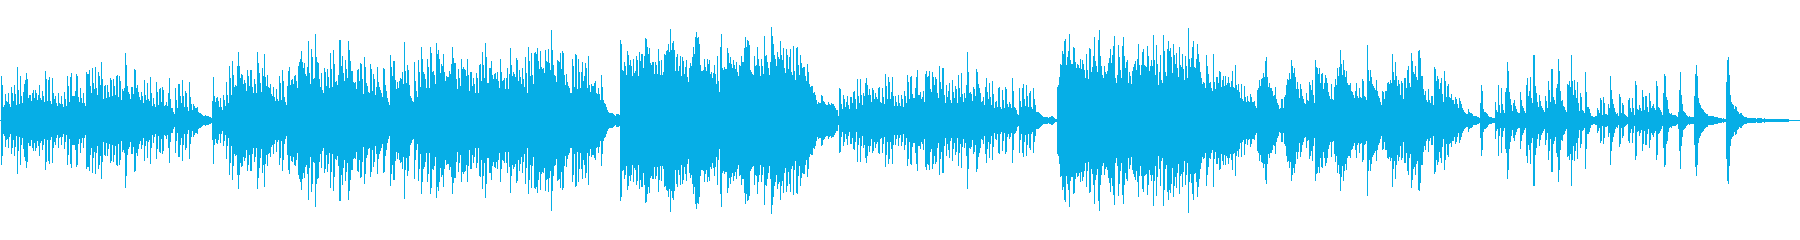 Sad, sad, beautiful piano solo's reproduced waveform